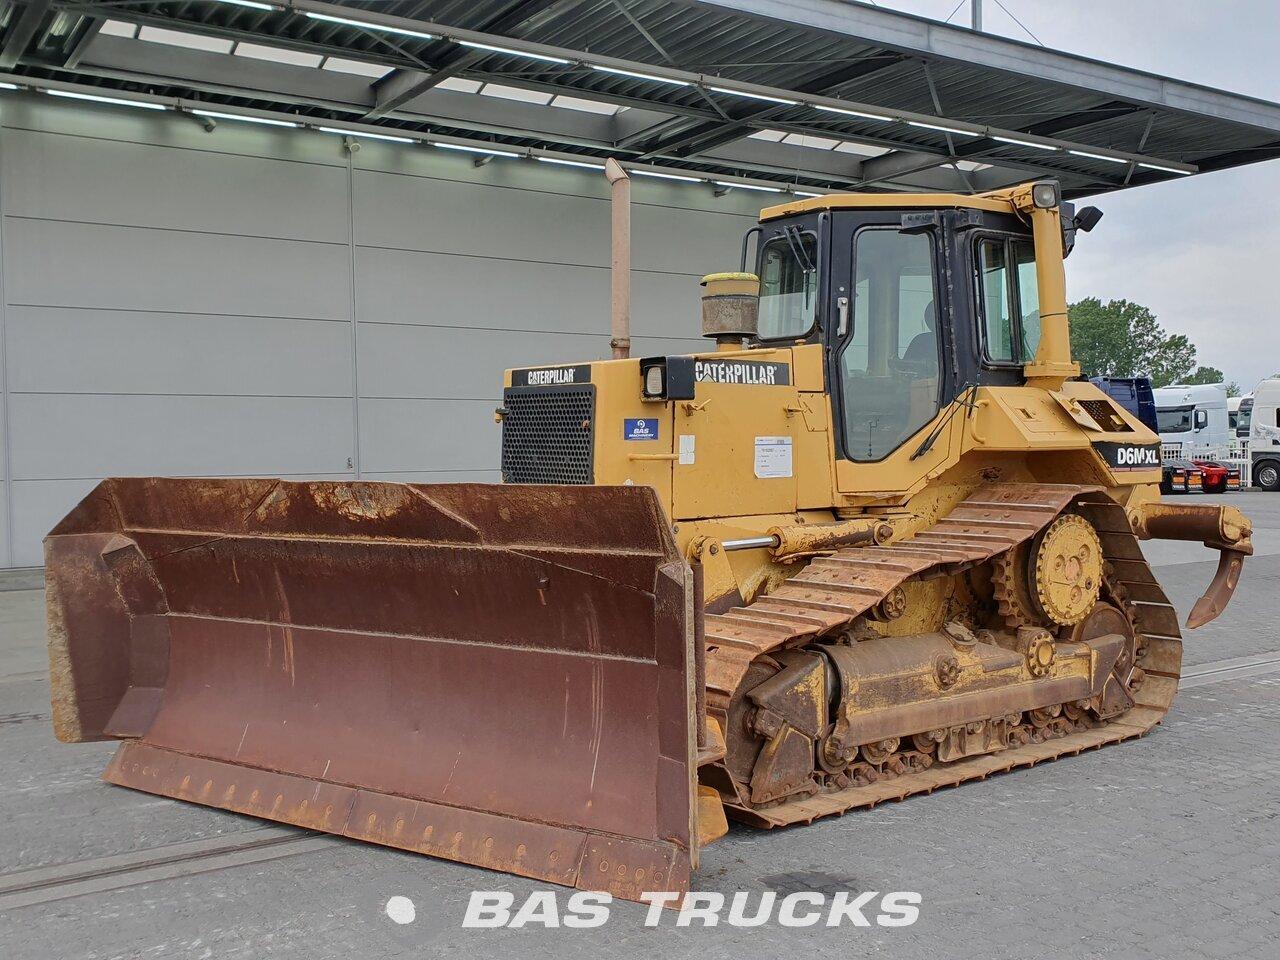 For sale at BAS Trucks: Caterpillar D6M XL Pat blade Track 01/1996